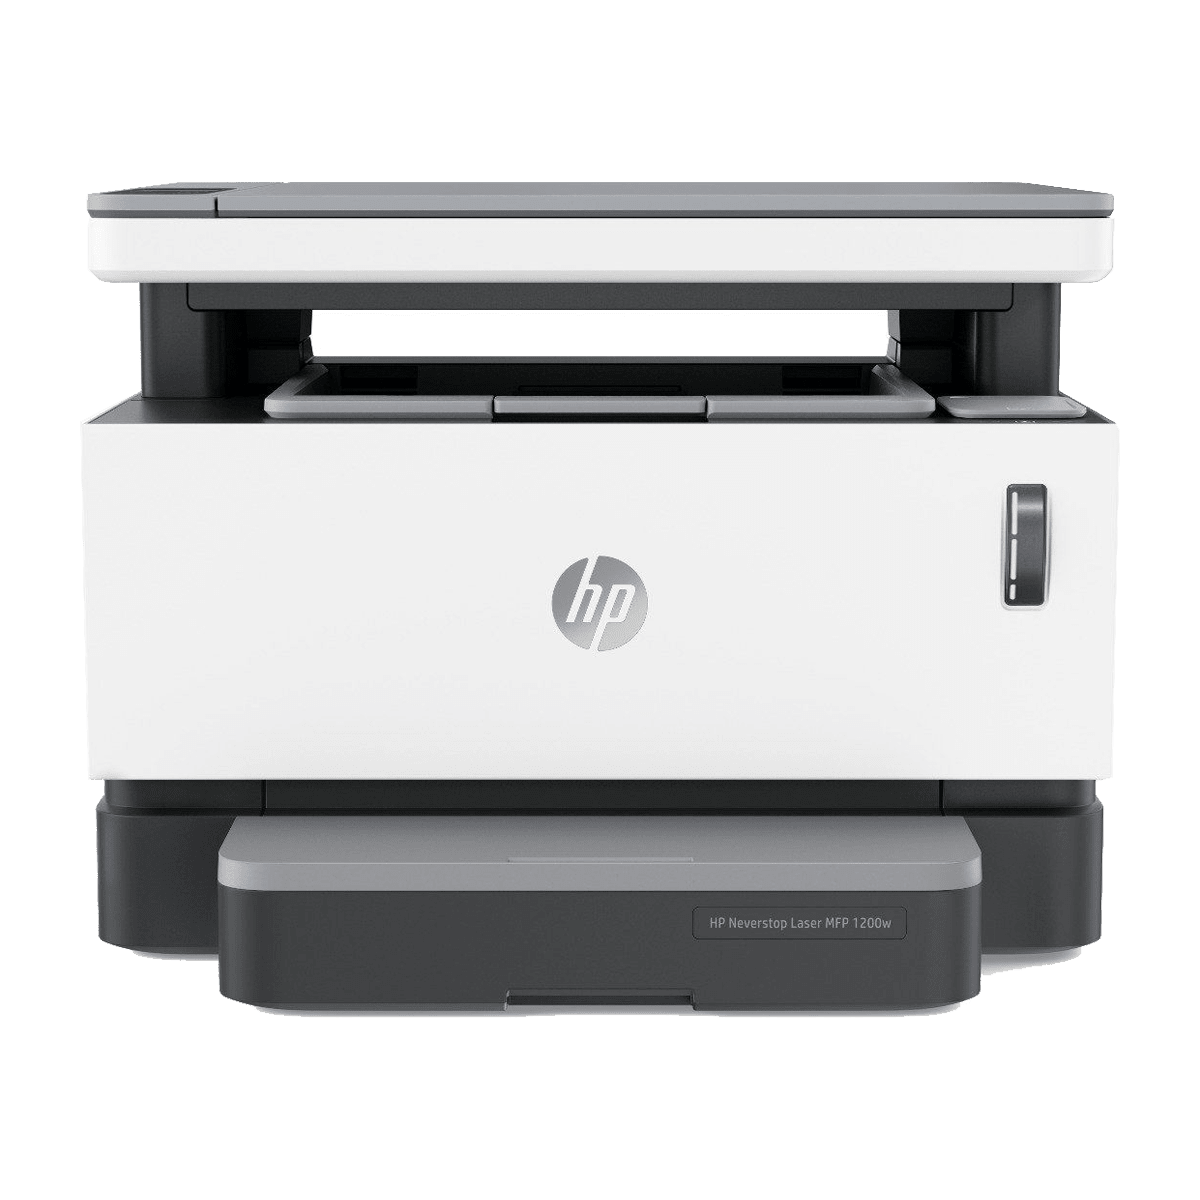 HP Neverstop Laserjet Printer (4RY26A, White)